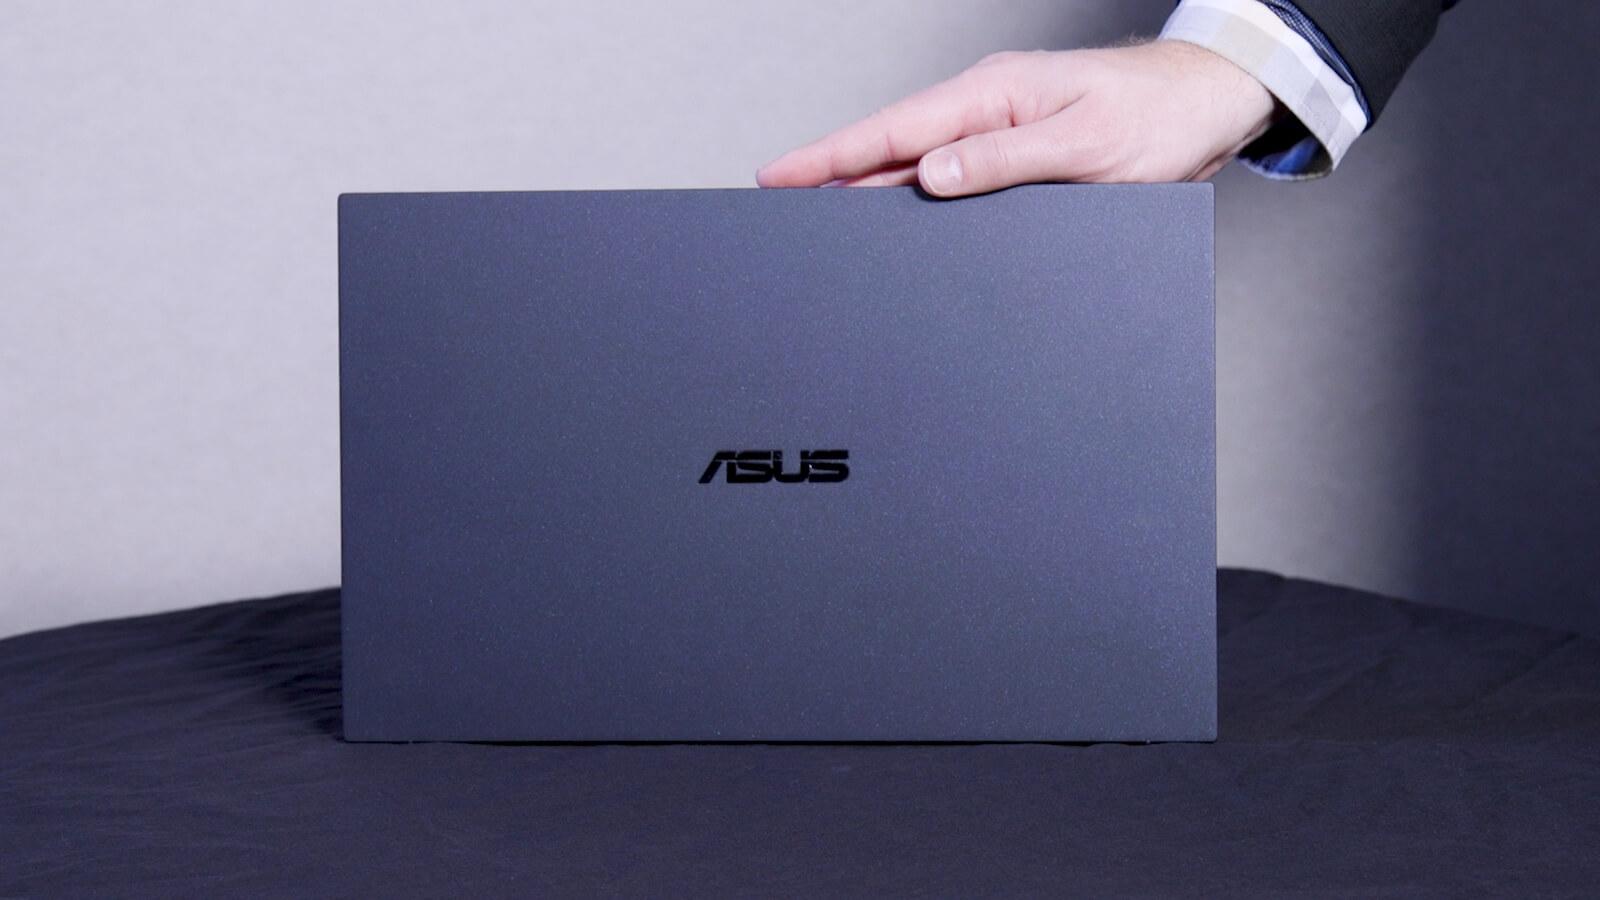 ASUS ExpertBook B9 Lightweight Laptop